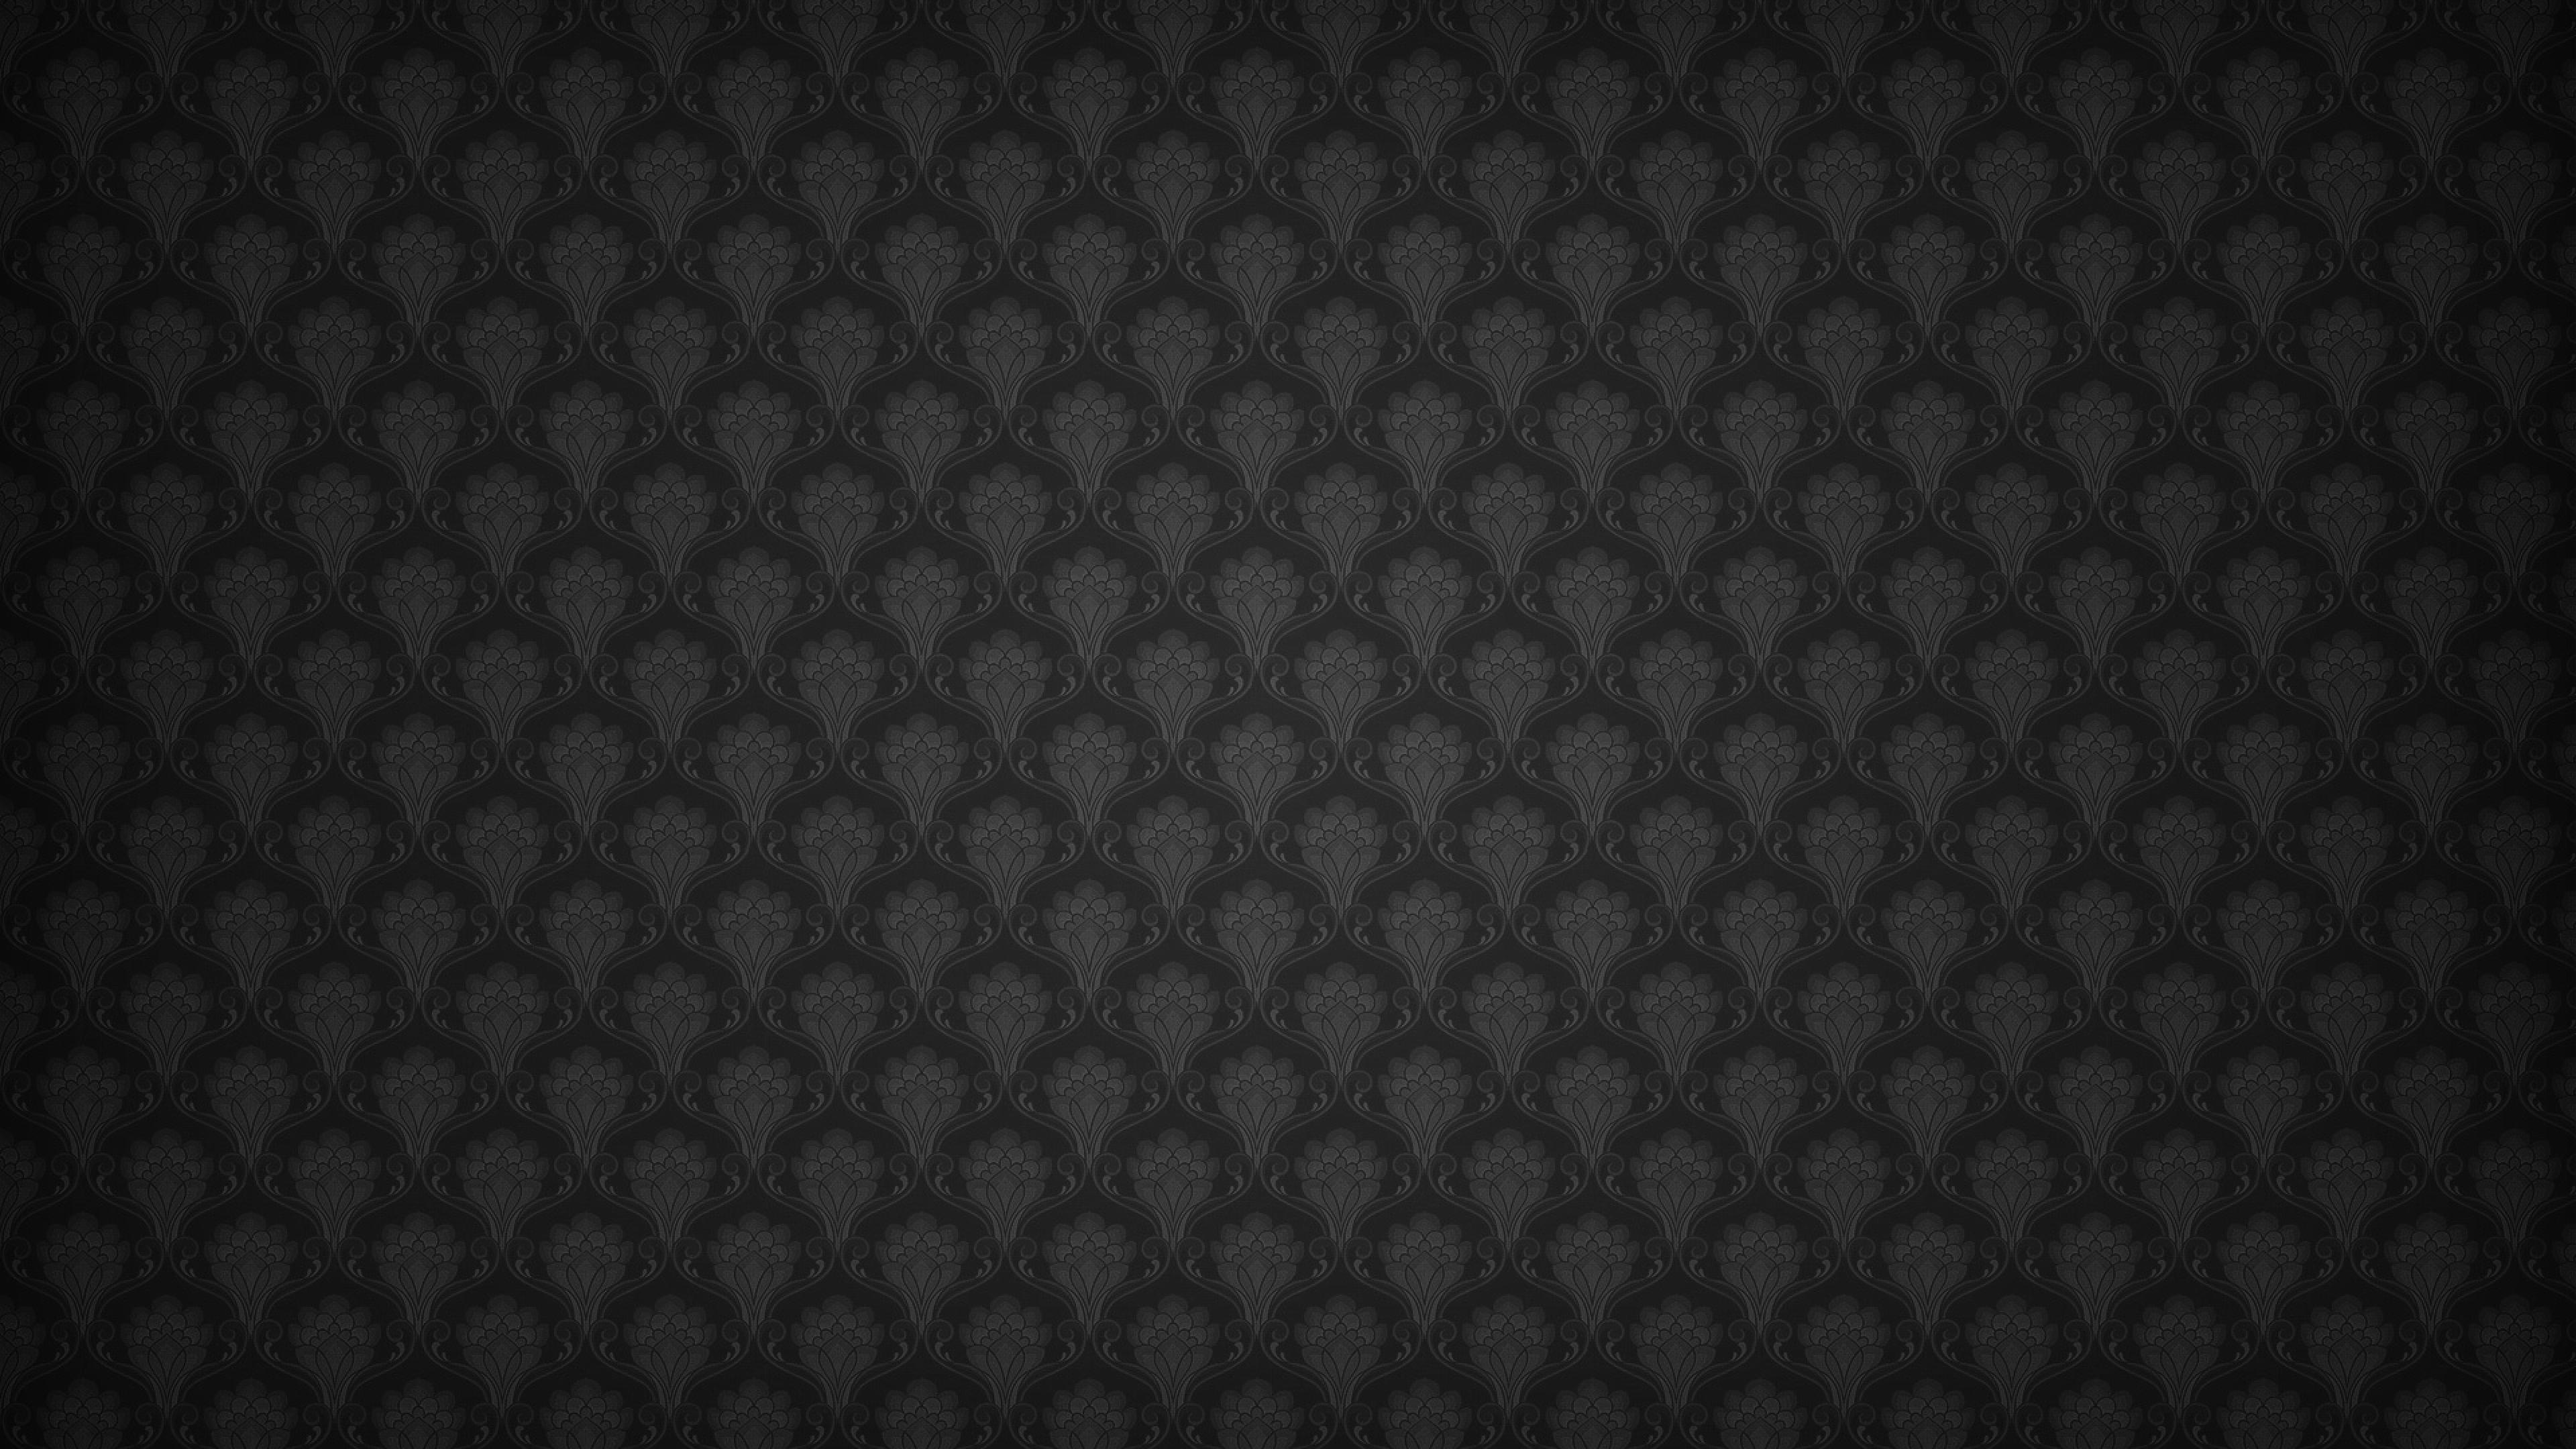 Download Wallpaper 3840x2160 Texture Pattern Black Line Surface 4K 3840x2160